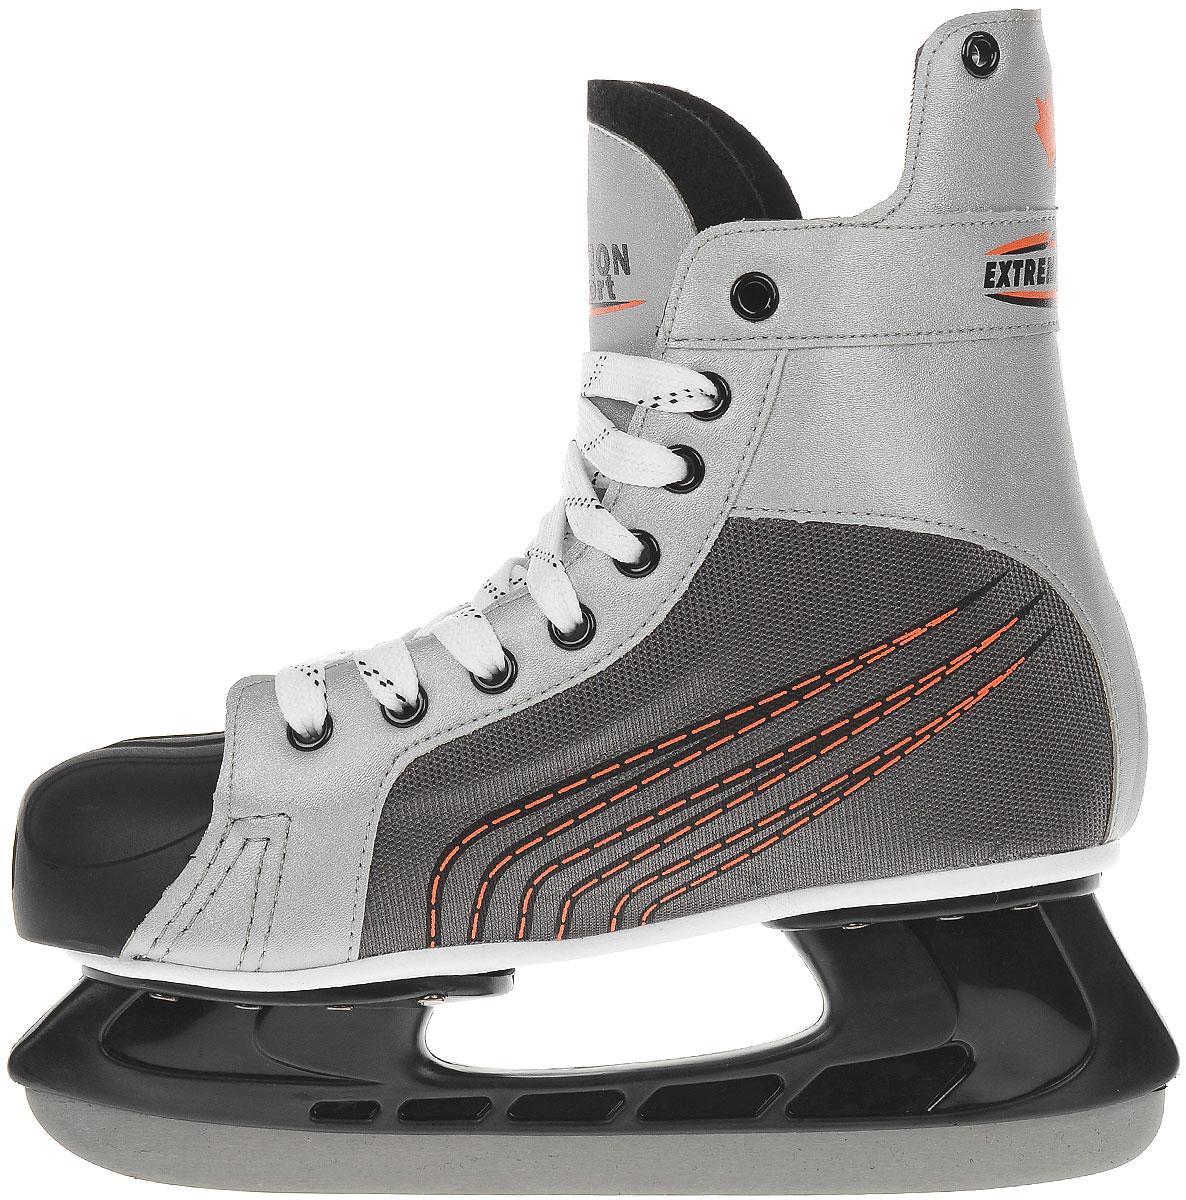 Коньки хоккейные мужские Action, цвет: белый, серый. PW-216N. Размер 46